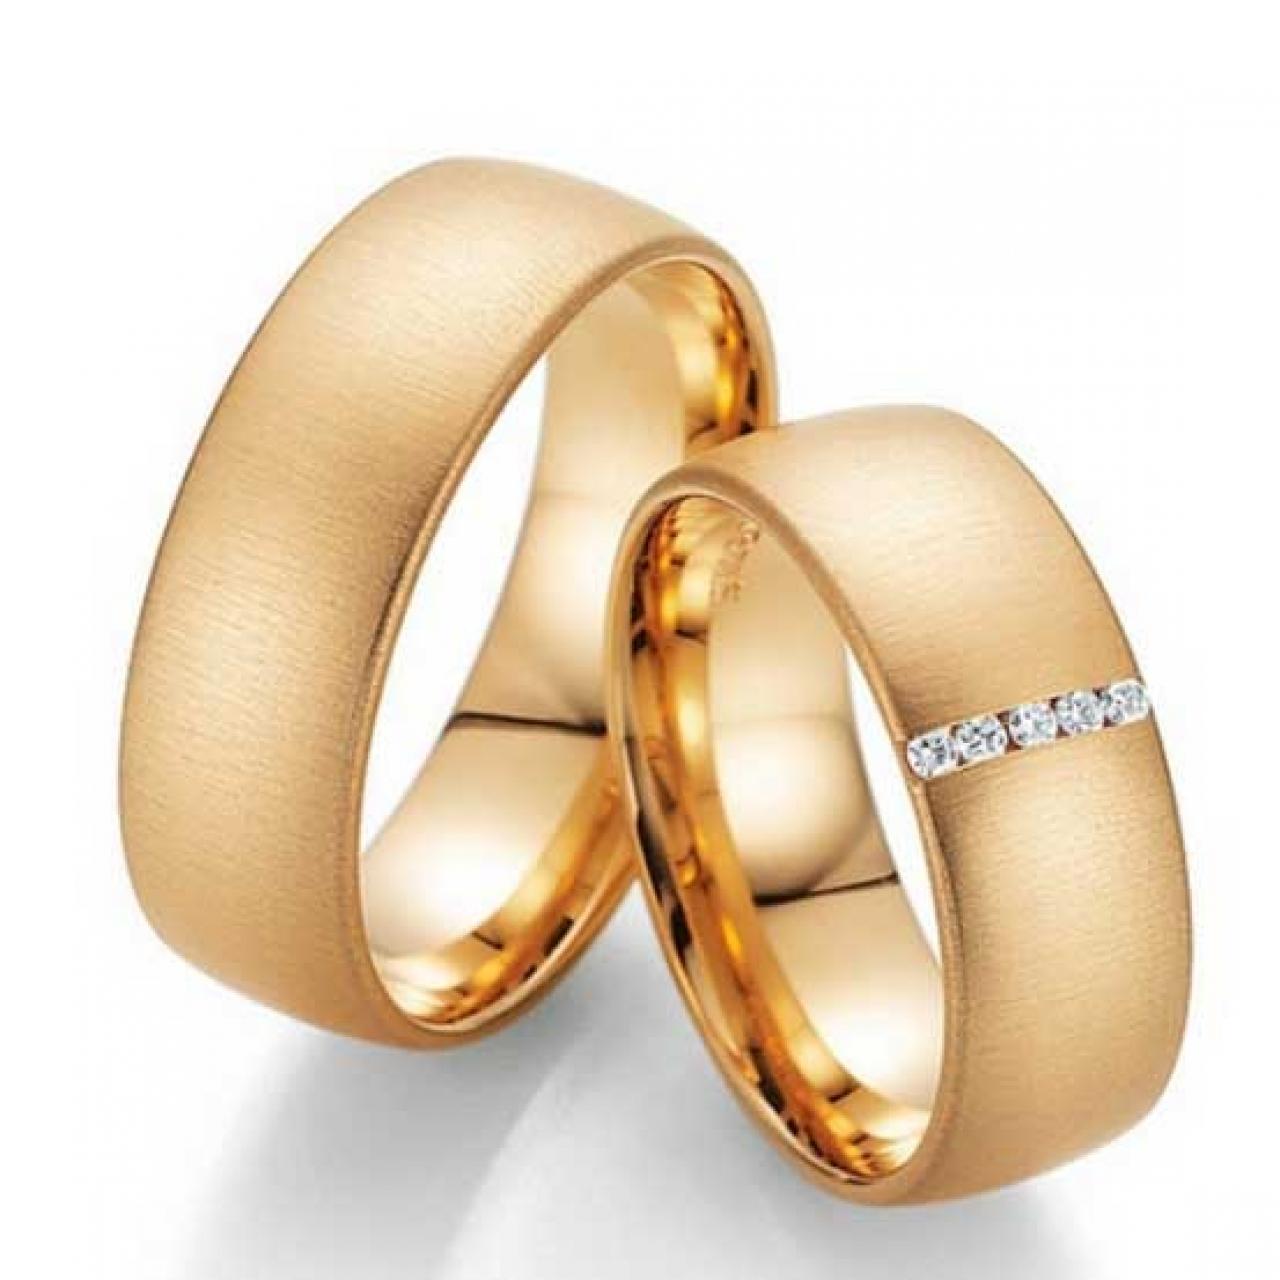 wedding-bands-rings-fischer-0607264-070-3807264-070-classics